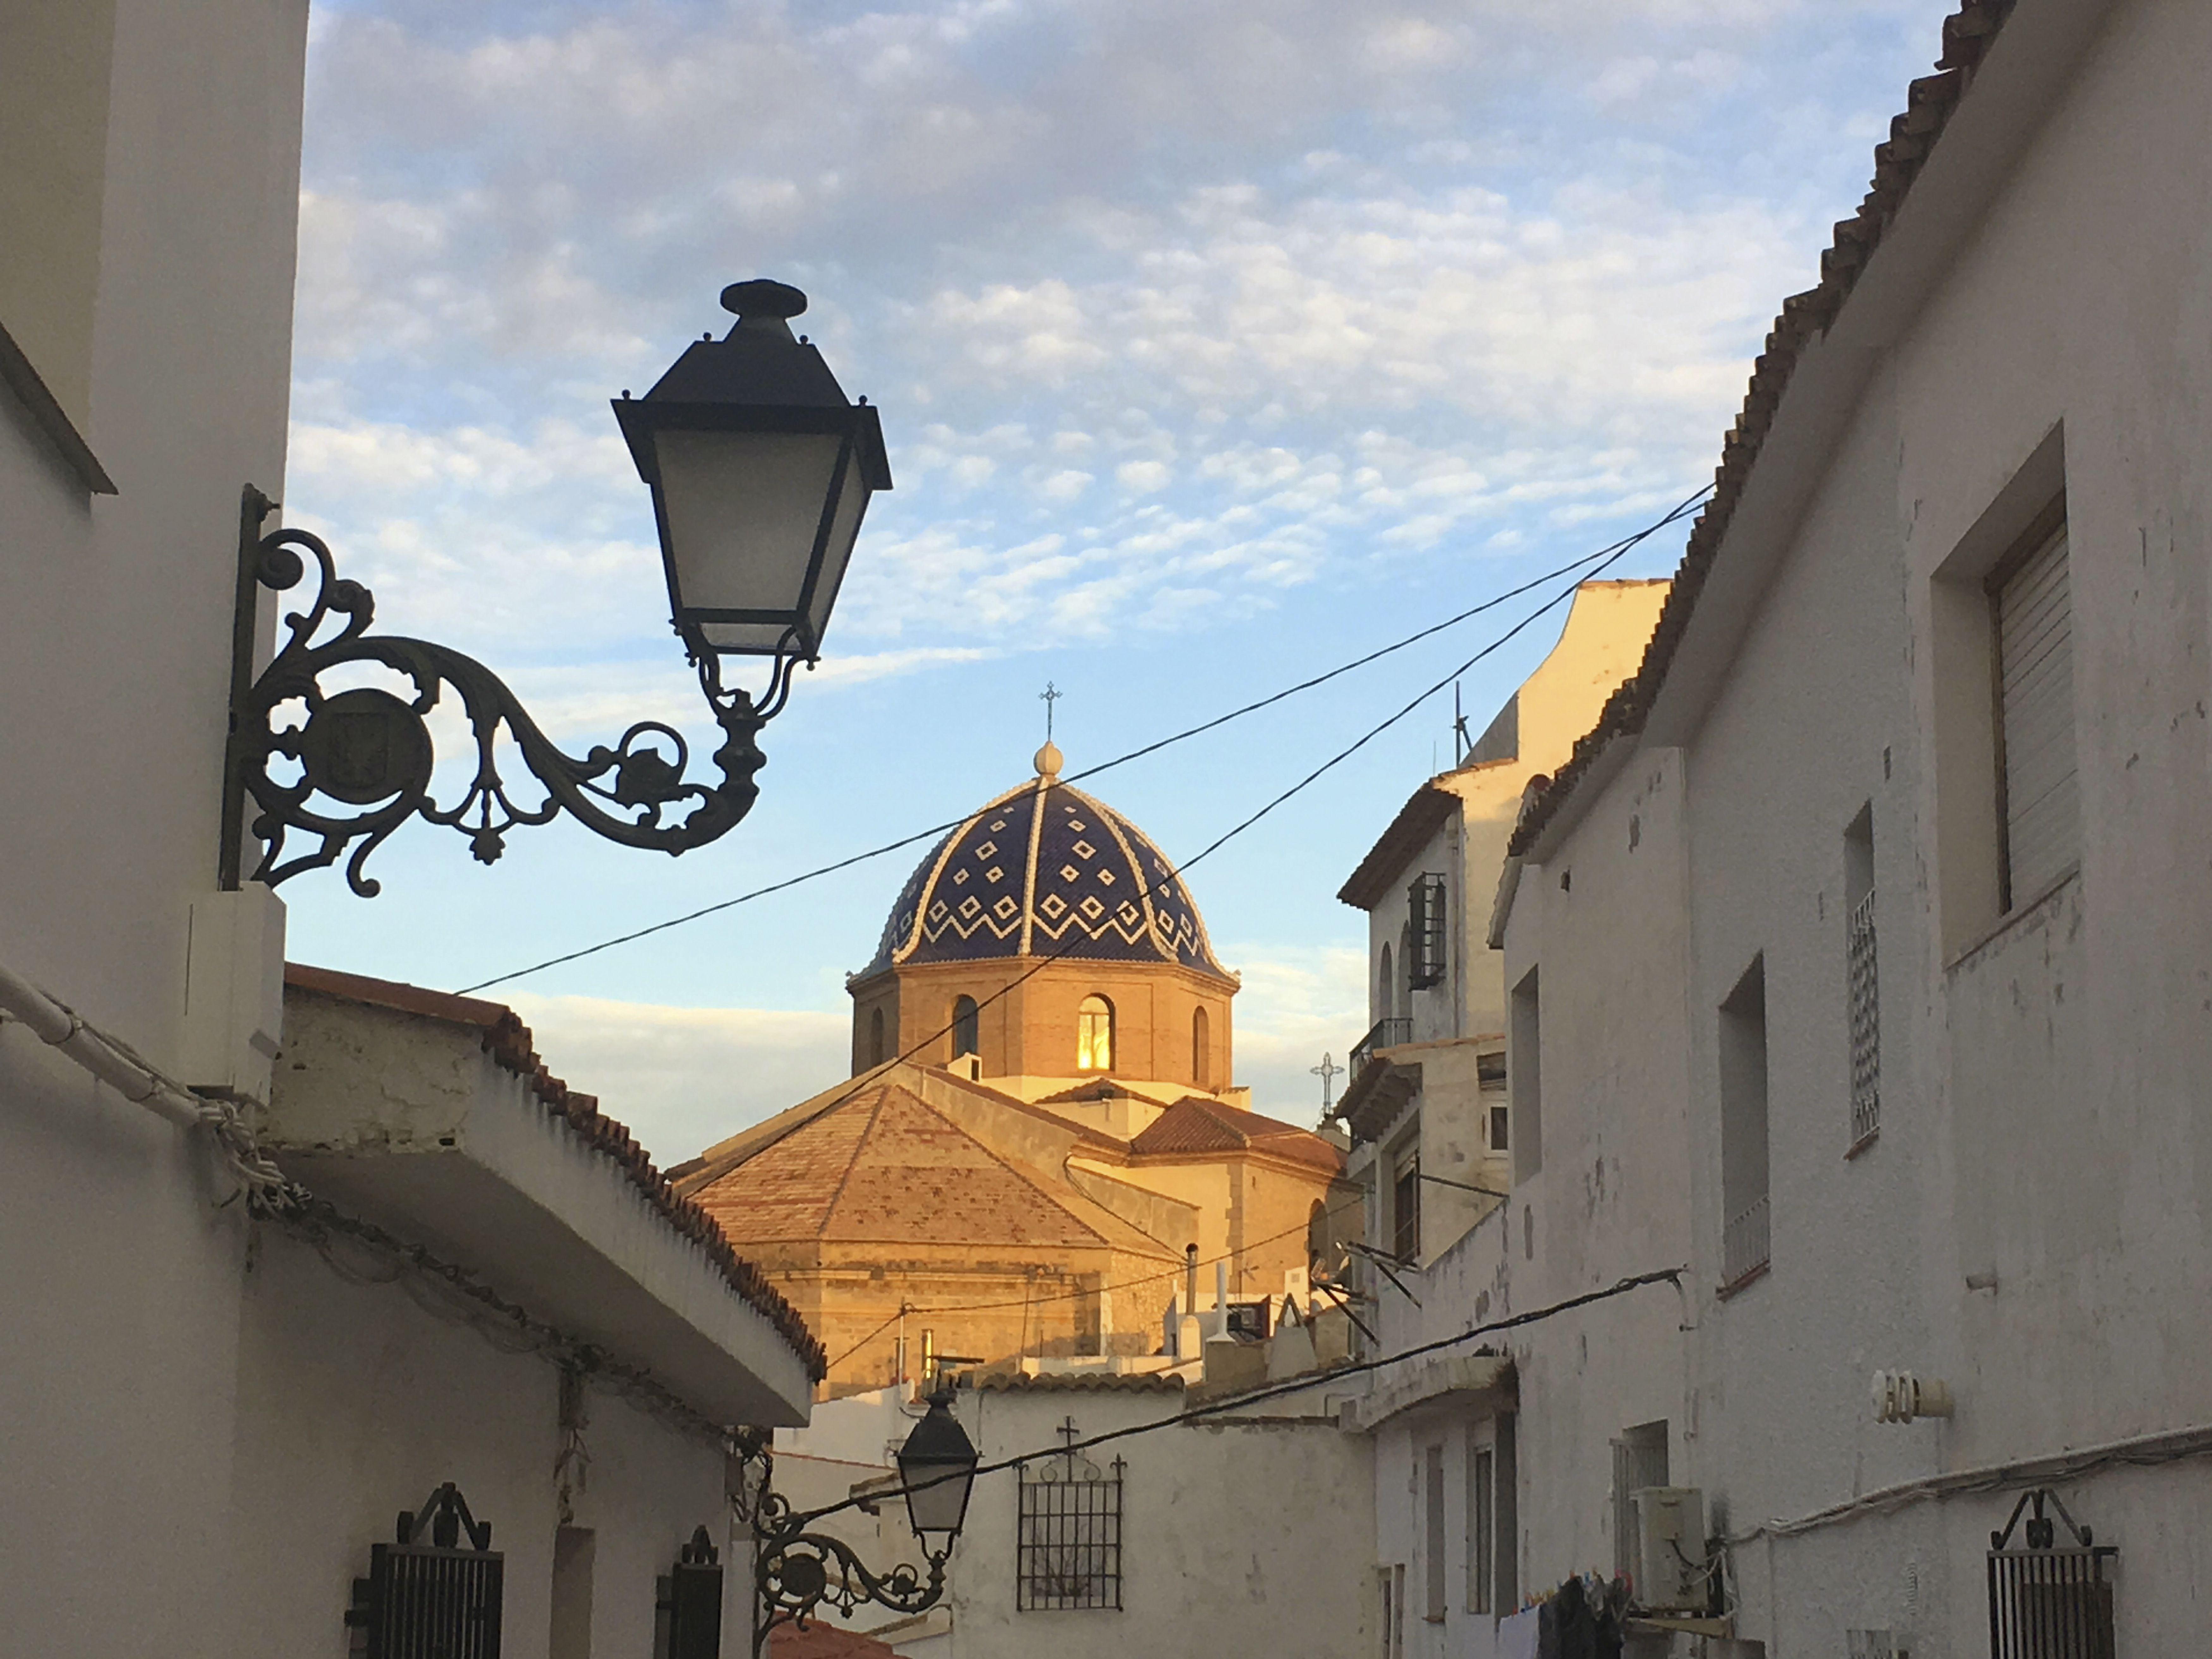 Altea, Costa Blanca, Alicante, Spain